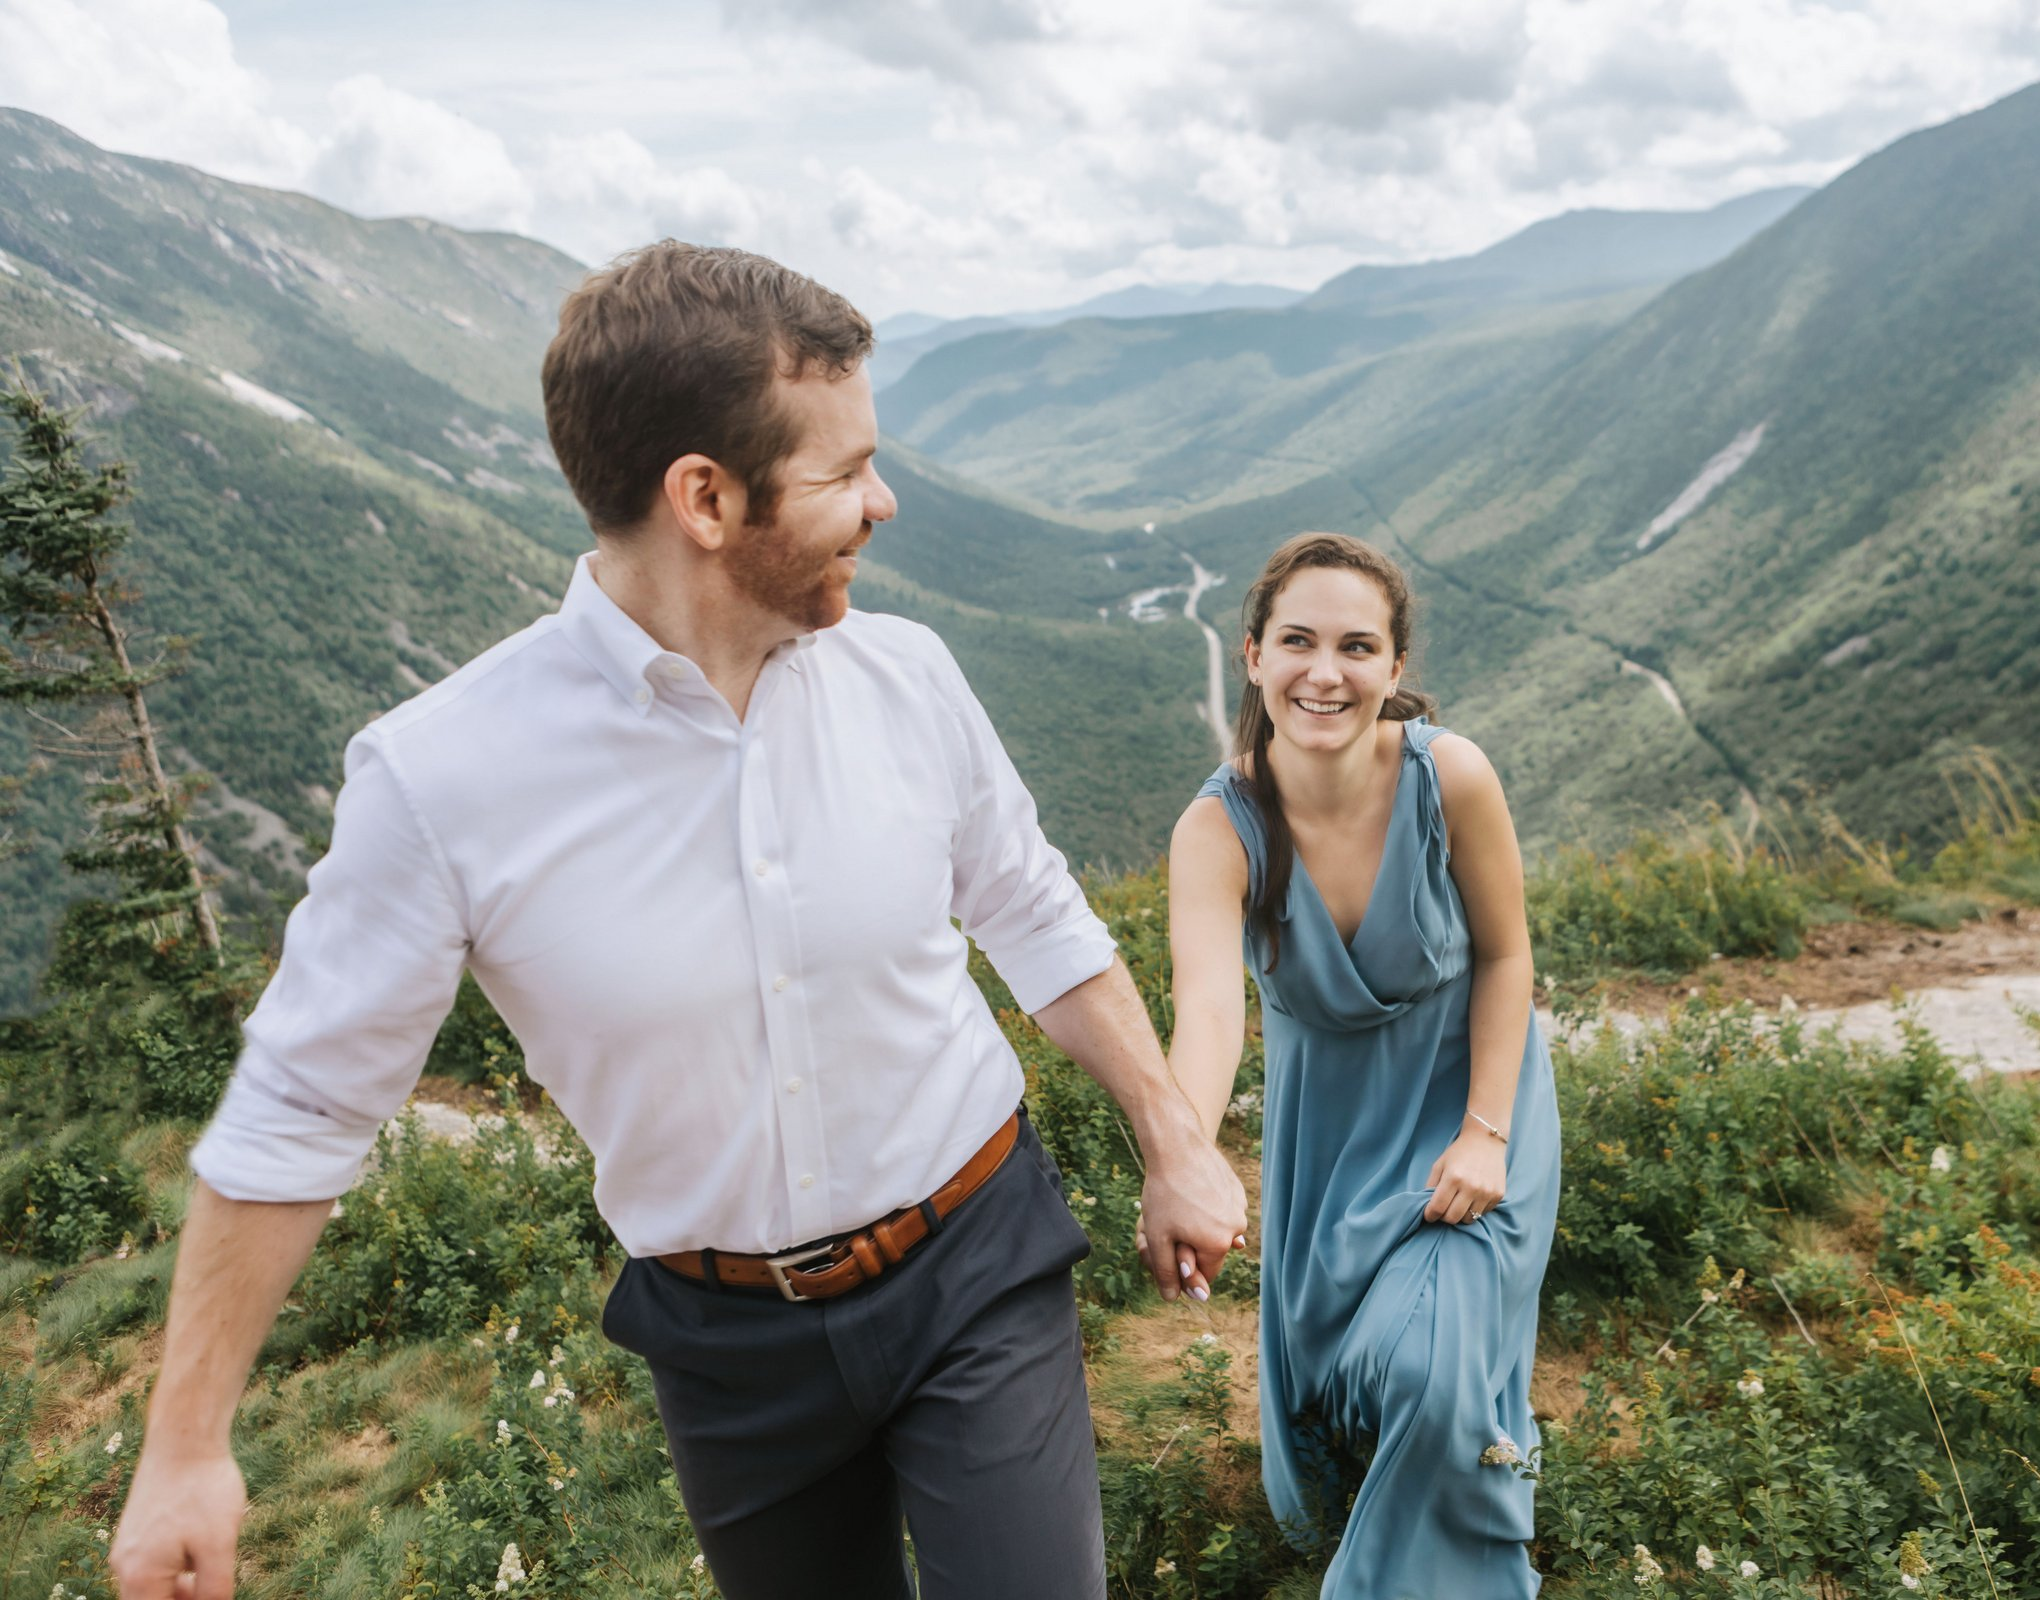 Mount-Willard-White-Mountains-Engagement-Elopement-Lena-Mirisola-18.JPG